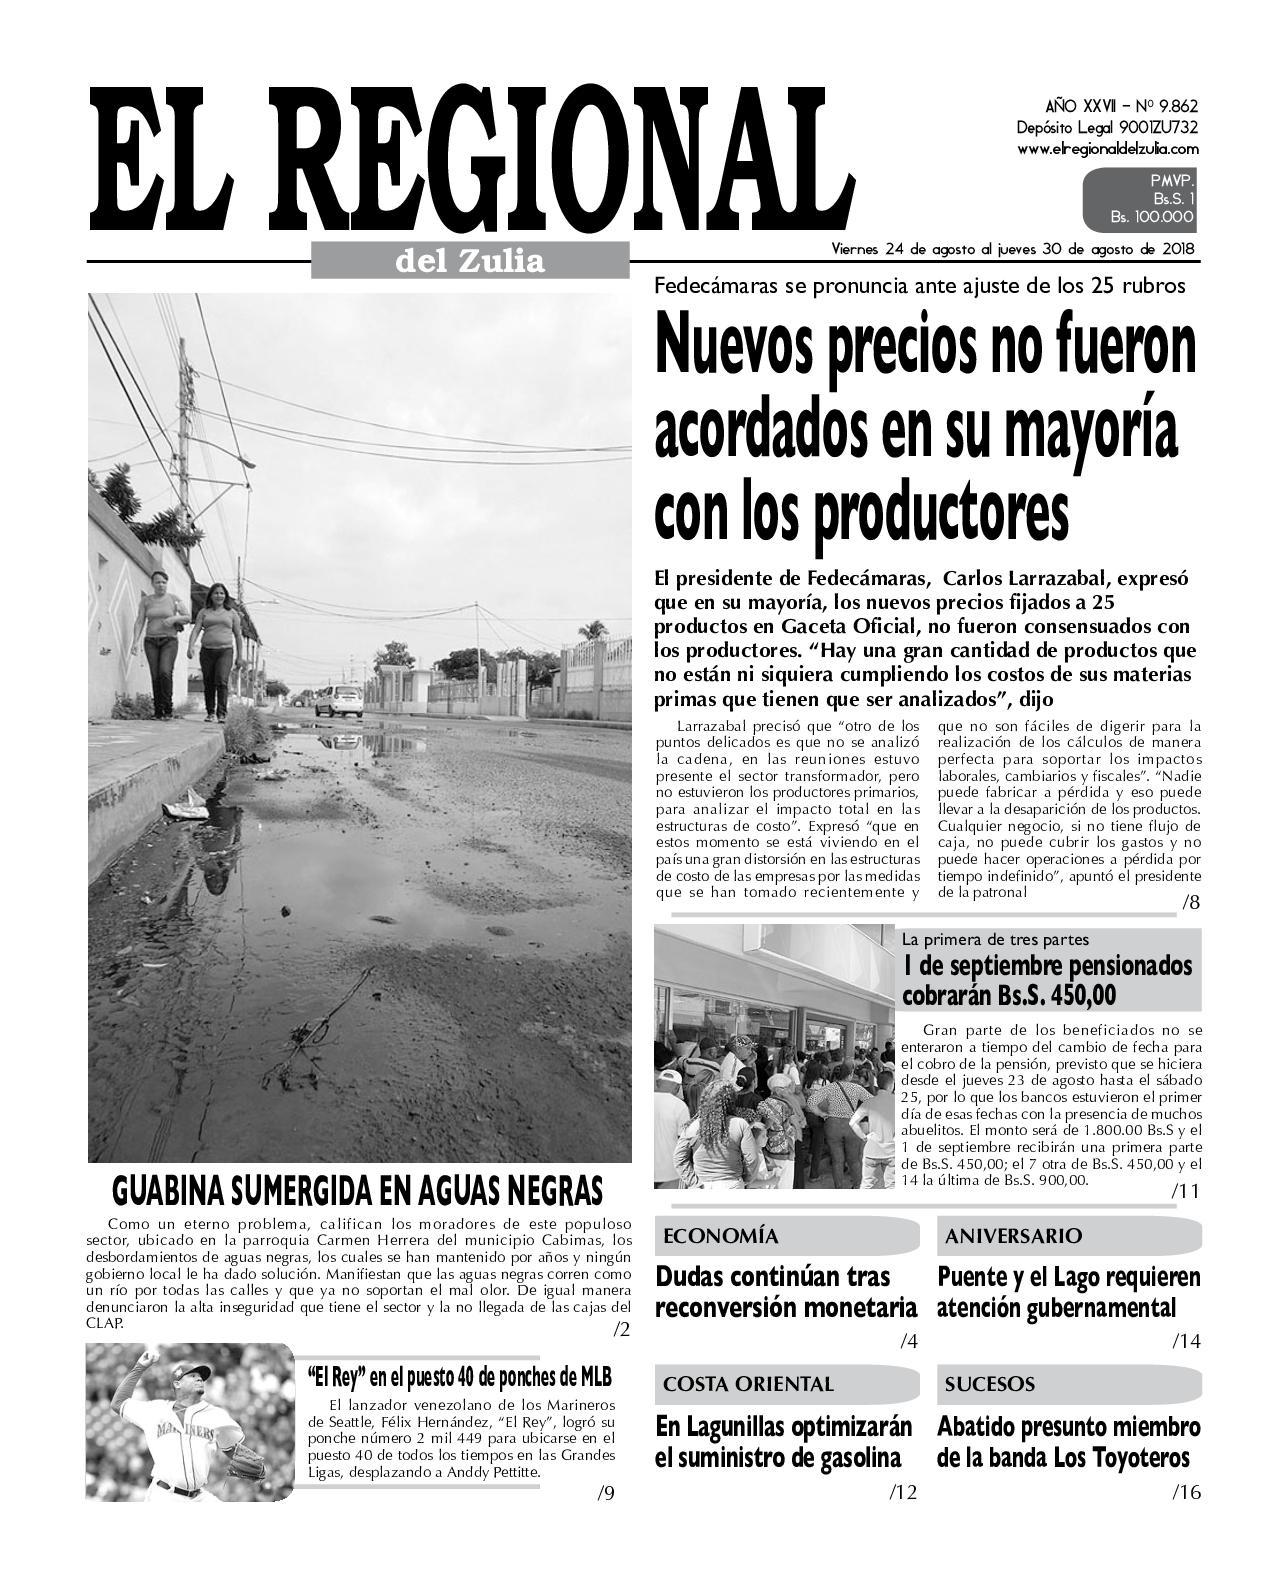 Calaméo - El Regional del Zulia 24-08-2018